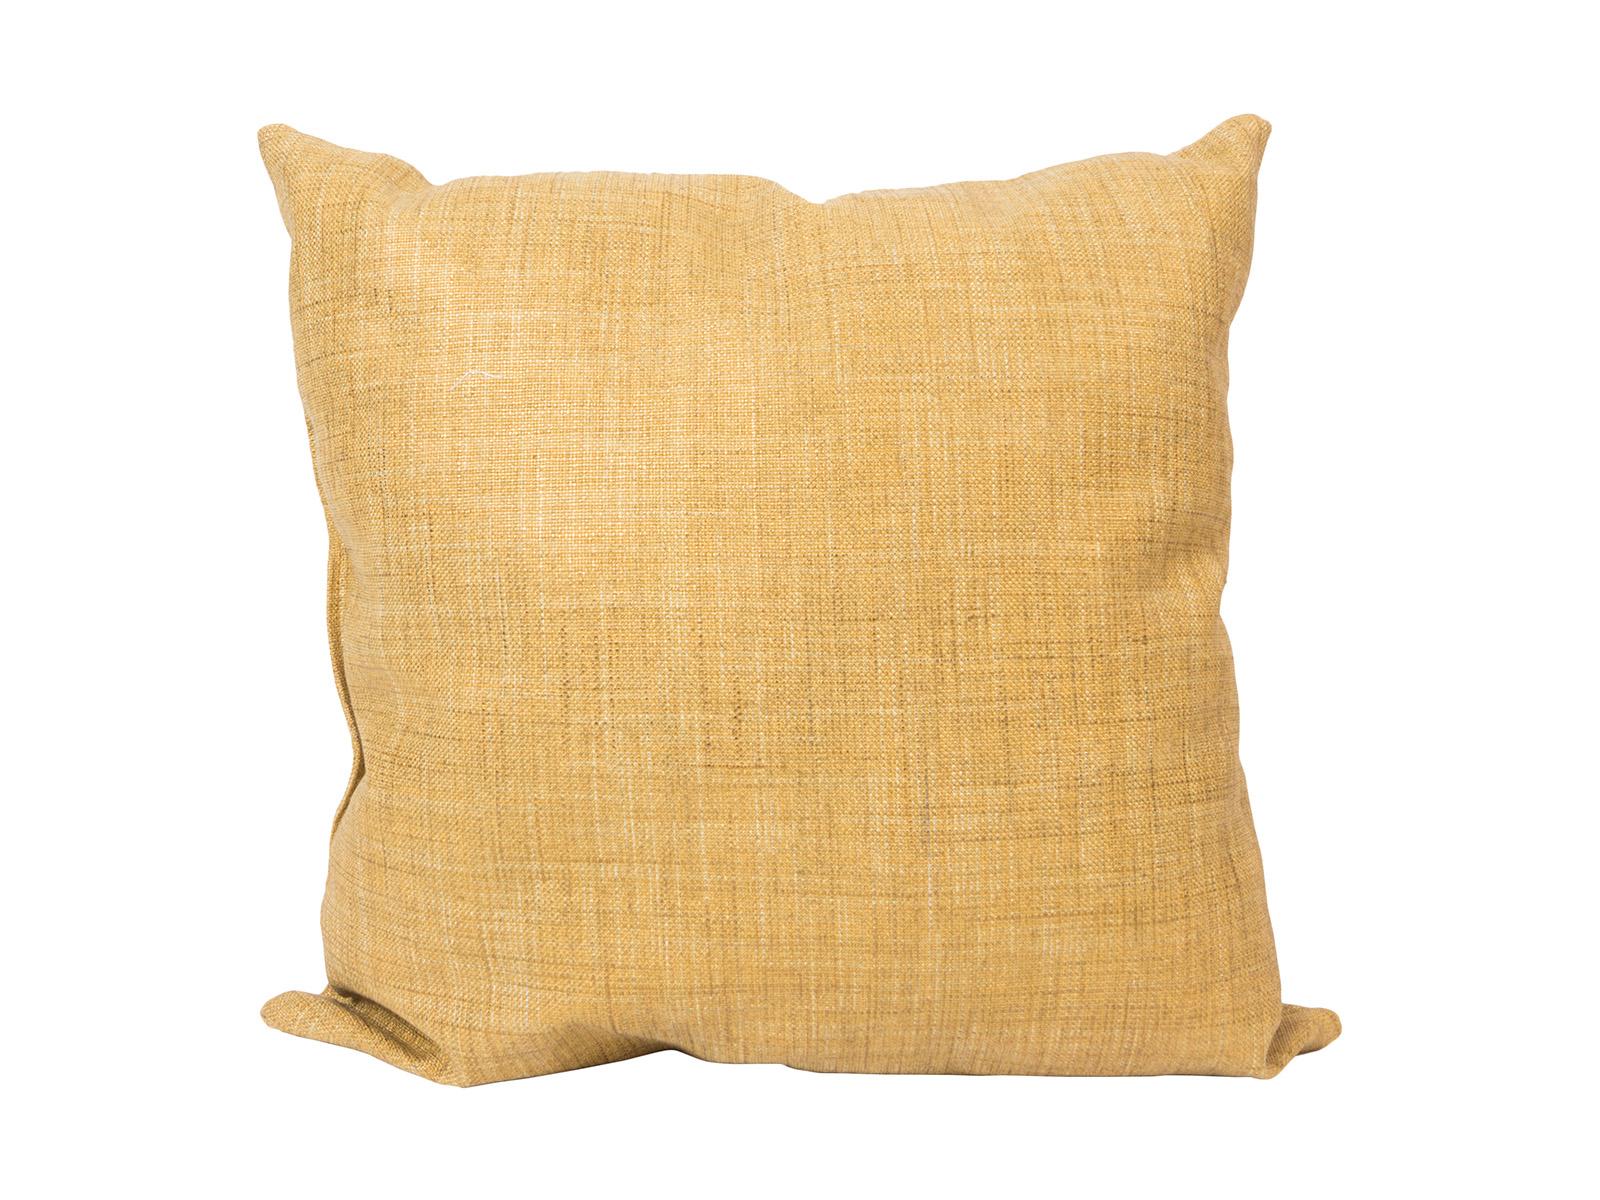 Подушка TahitiДекоративные подушки<br>Декоративная подушка<br>